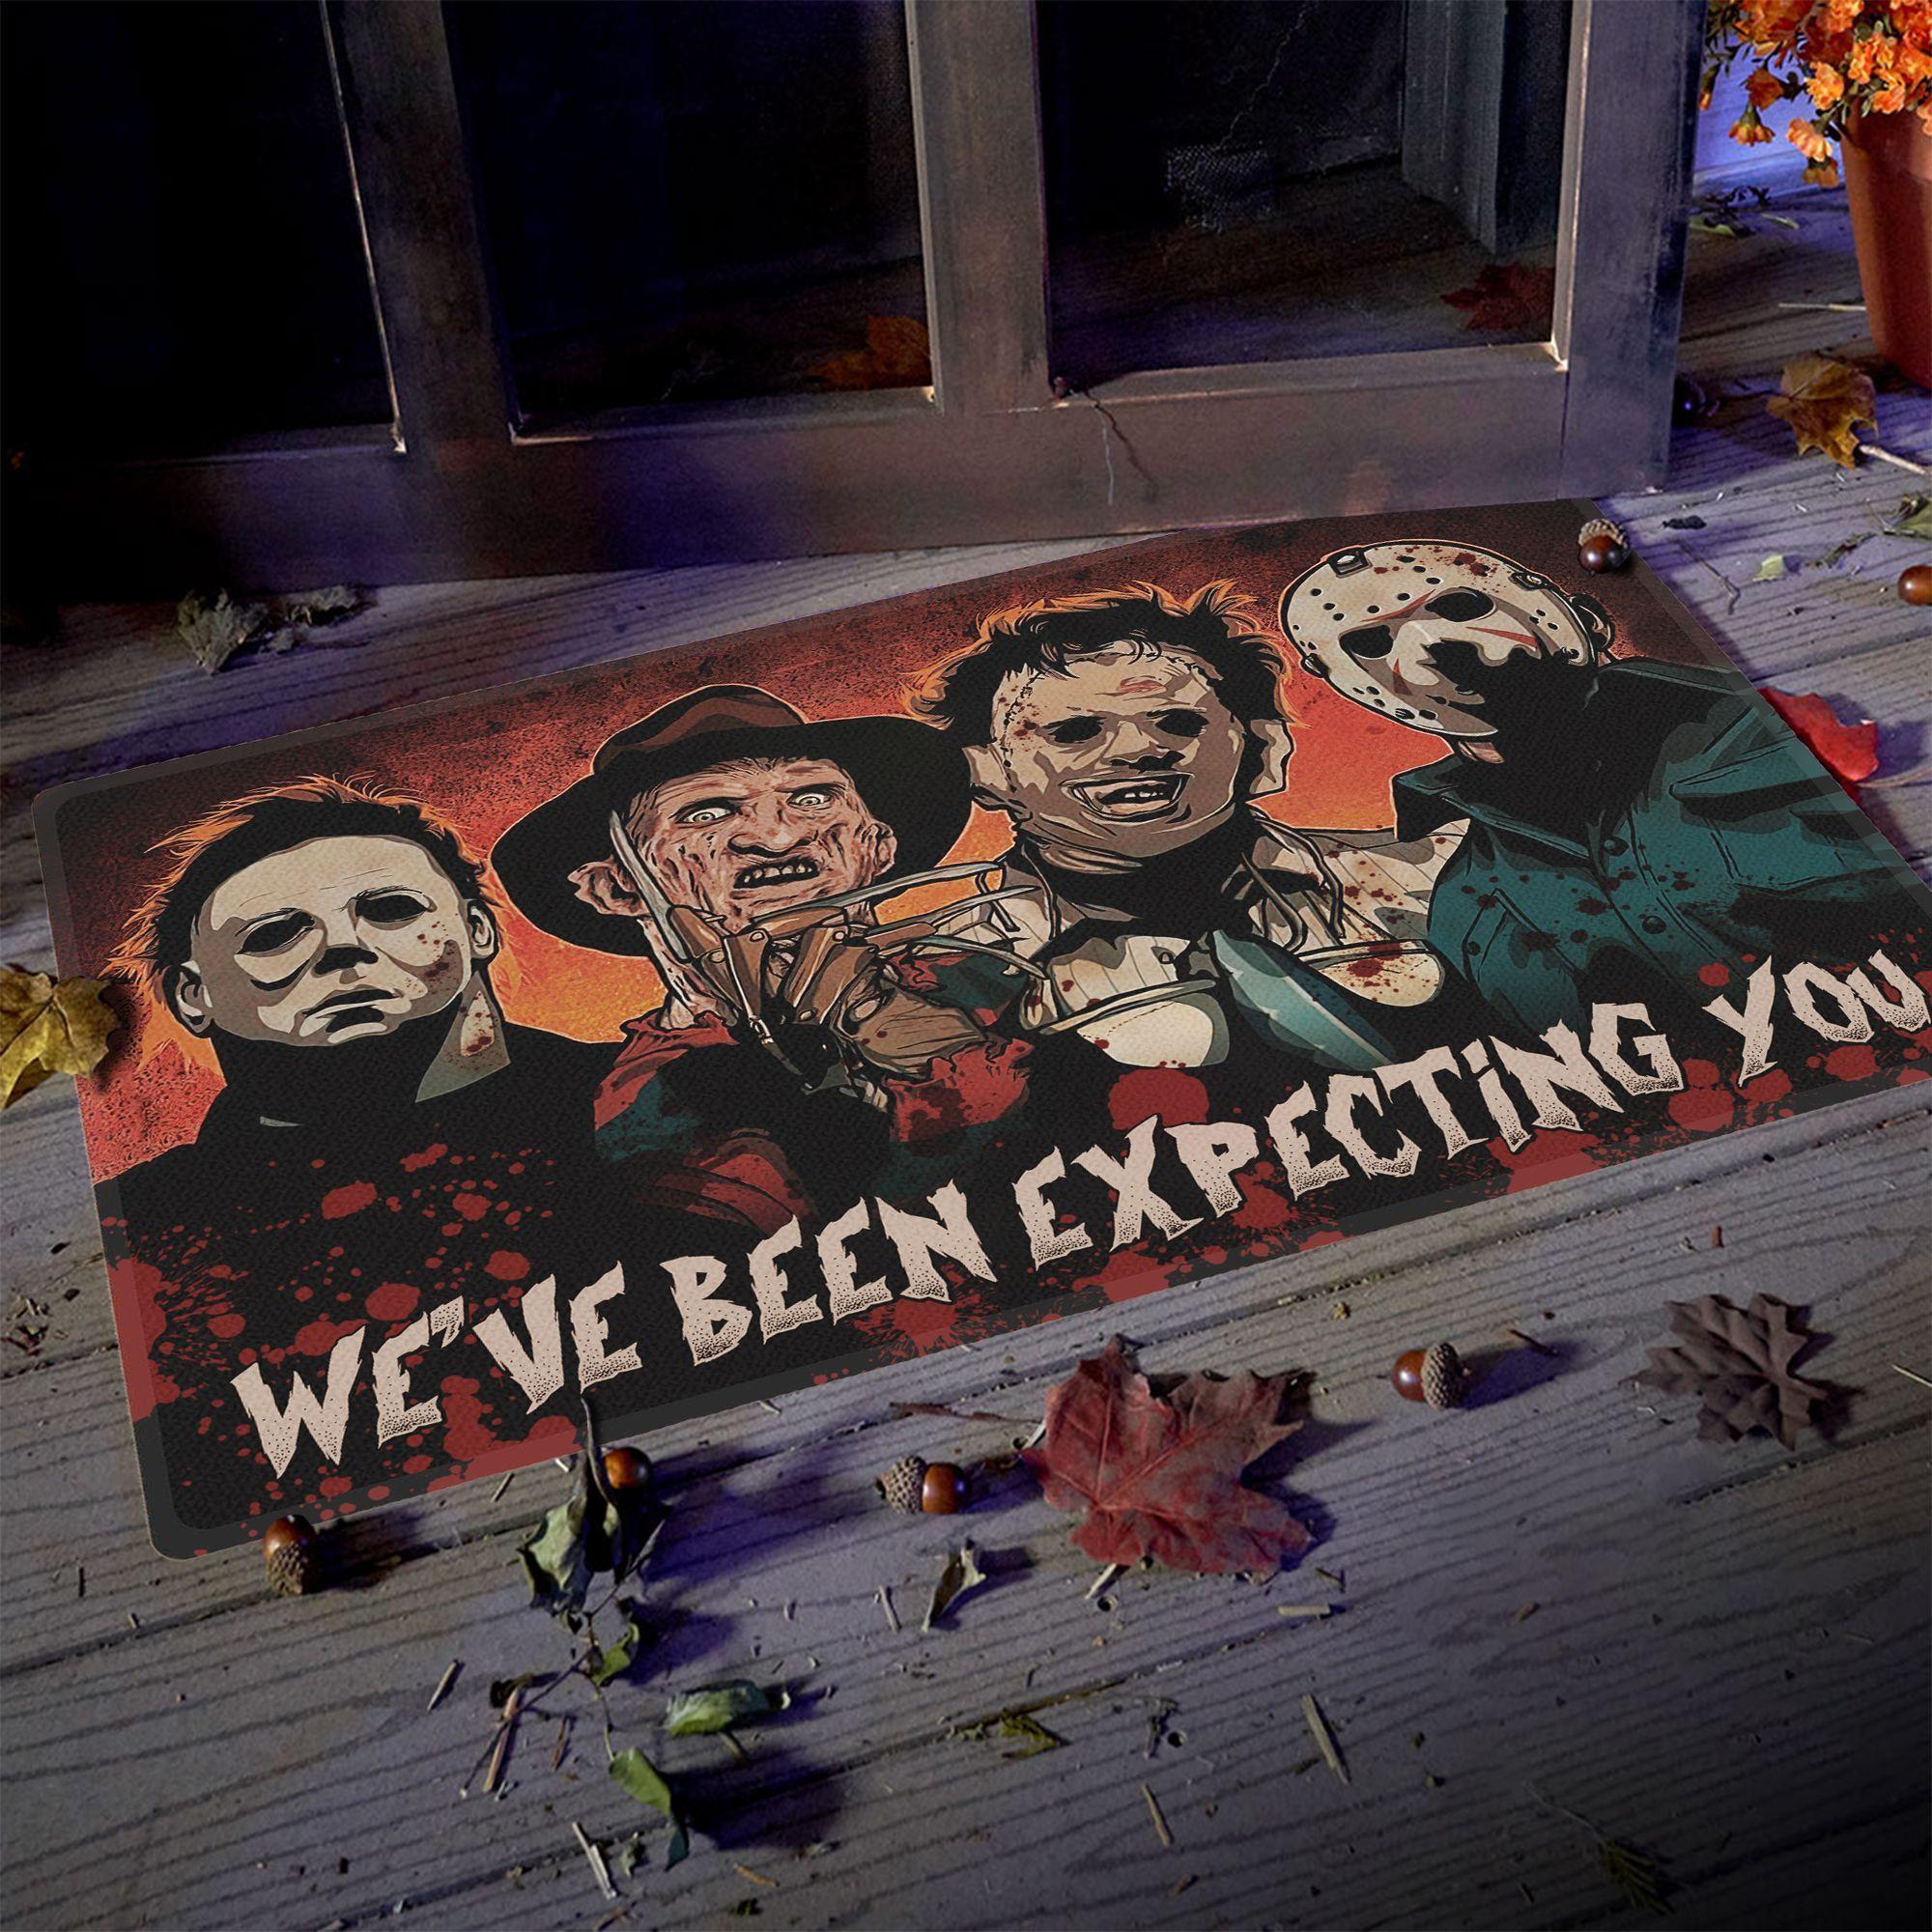 Horror characters We have been Expecting You Doormat